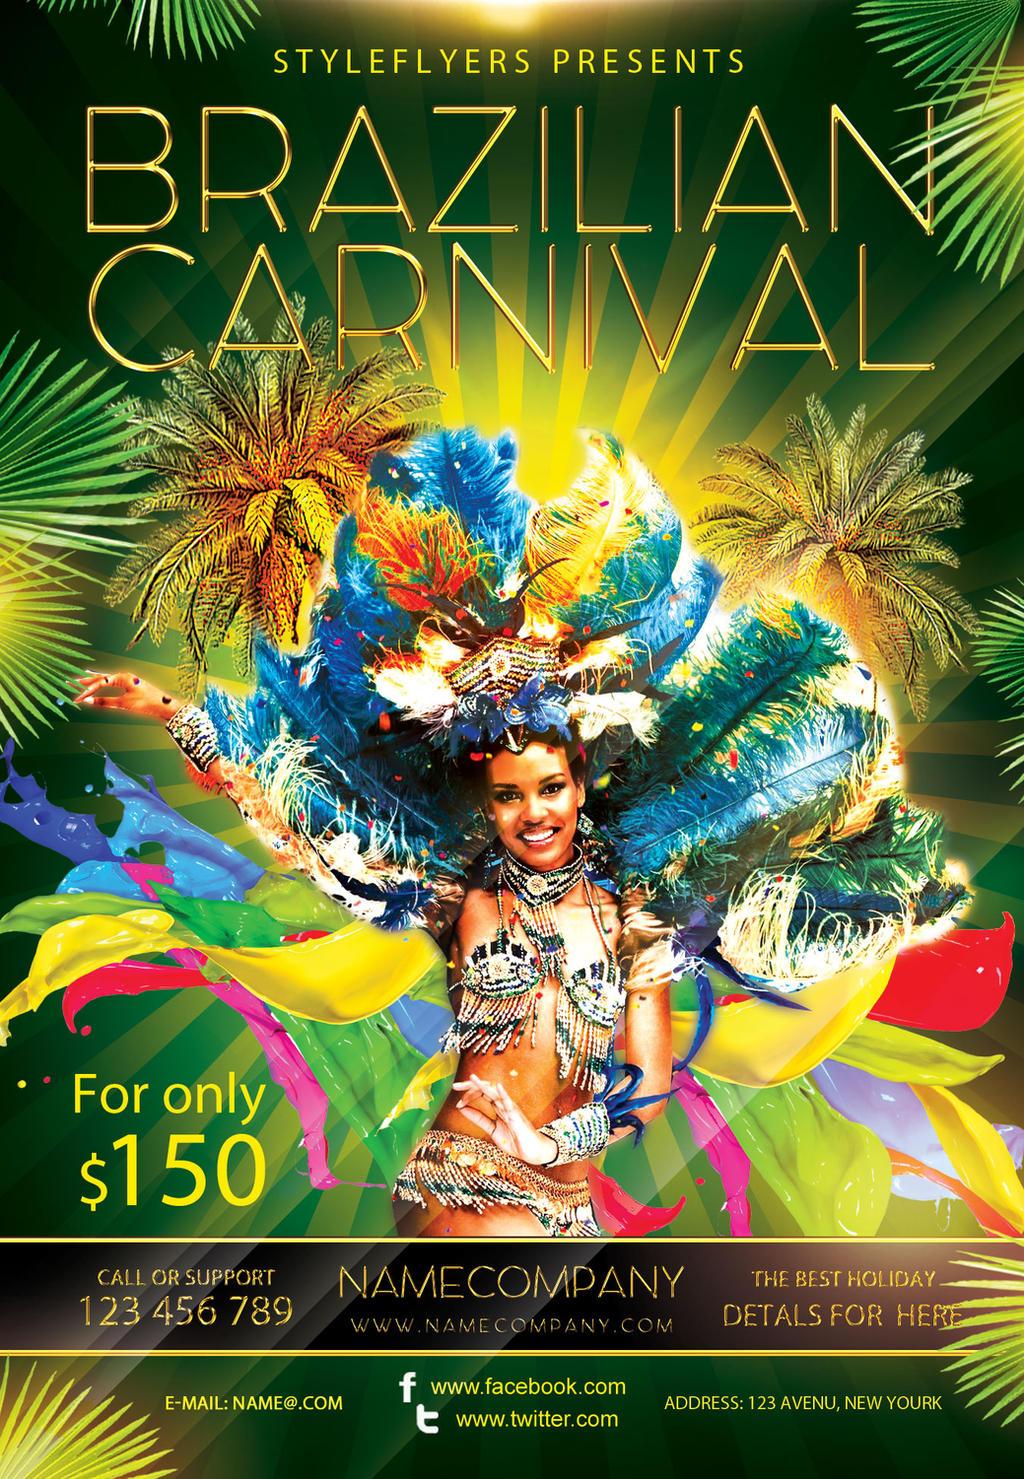 Brazilian-carnival-travel-flyer by Styleflyers on DeviantArt